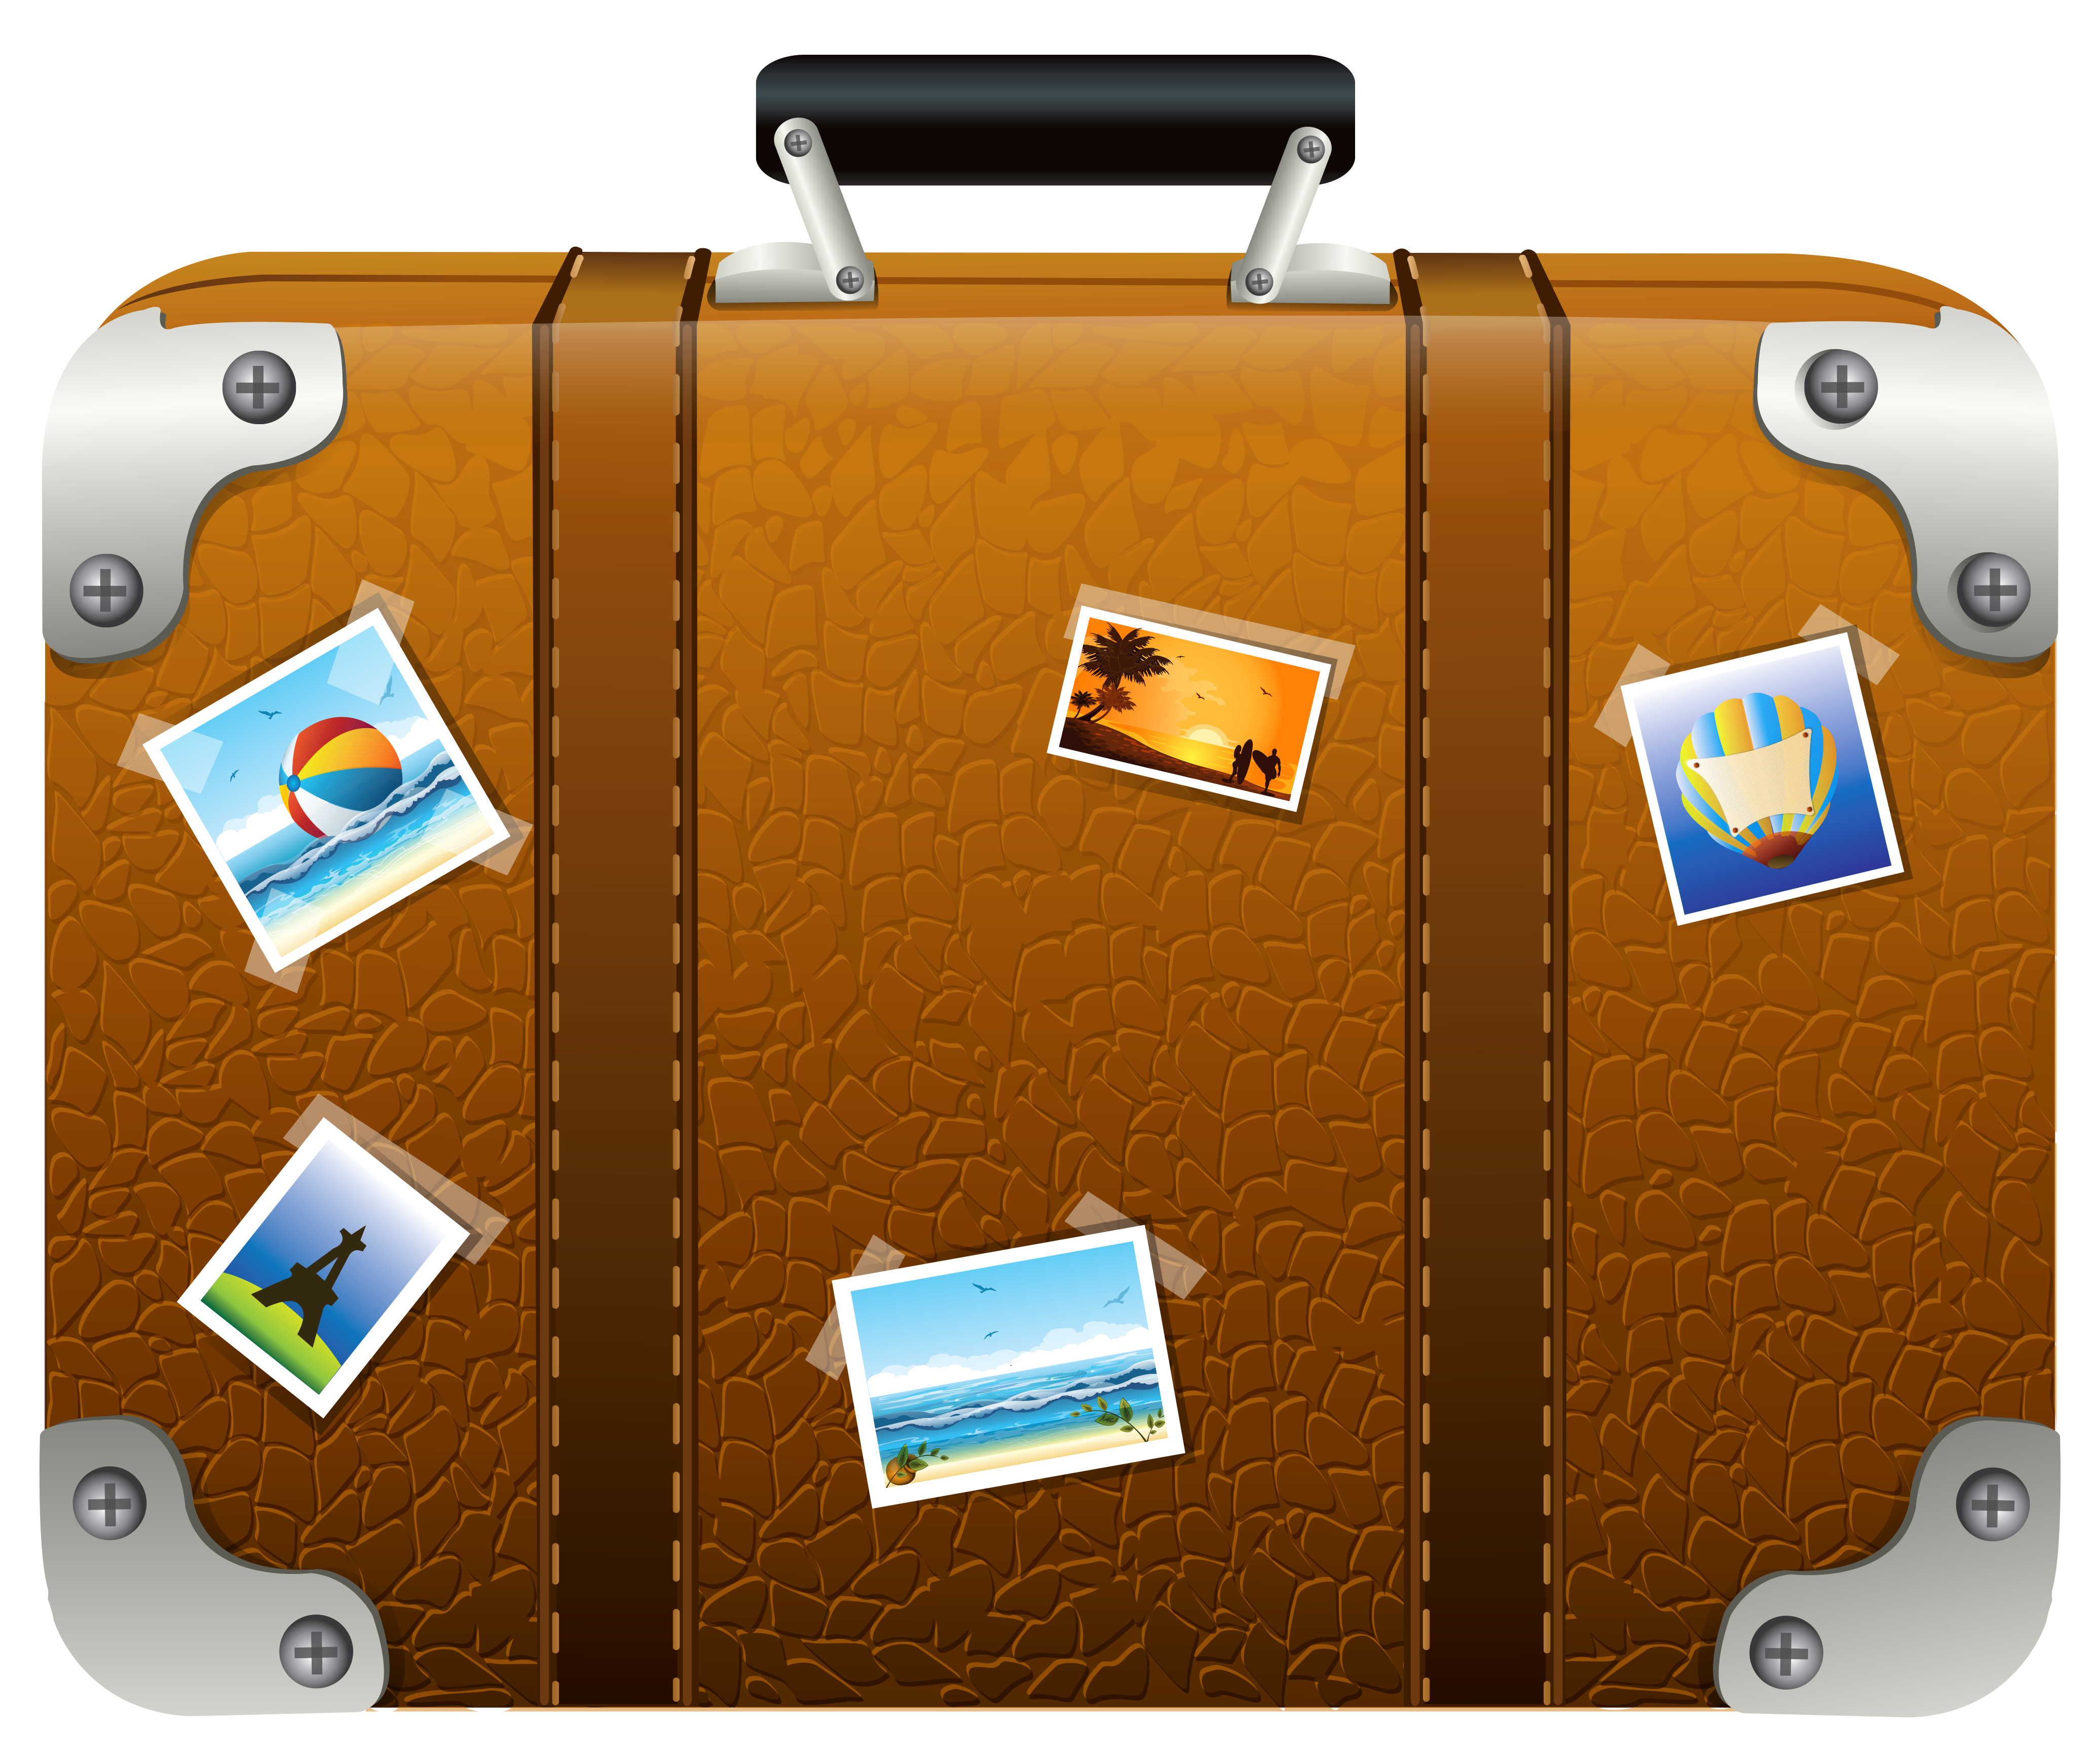 Clip Art Suitcase Clipart suitcase clipa-Clip Art Suitcase Clipart suitcase clipart clipartall free-5